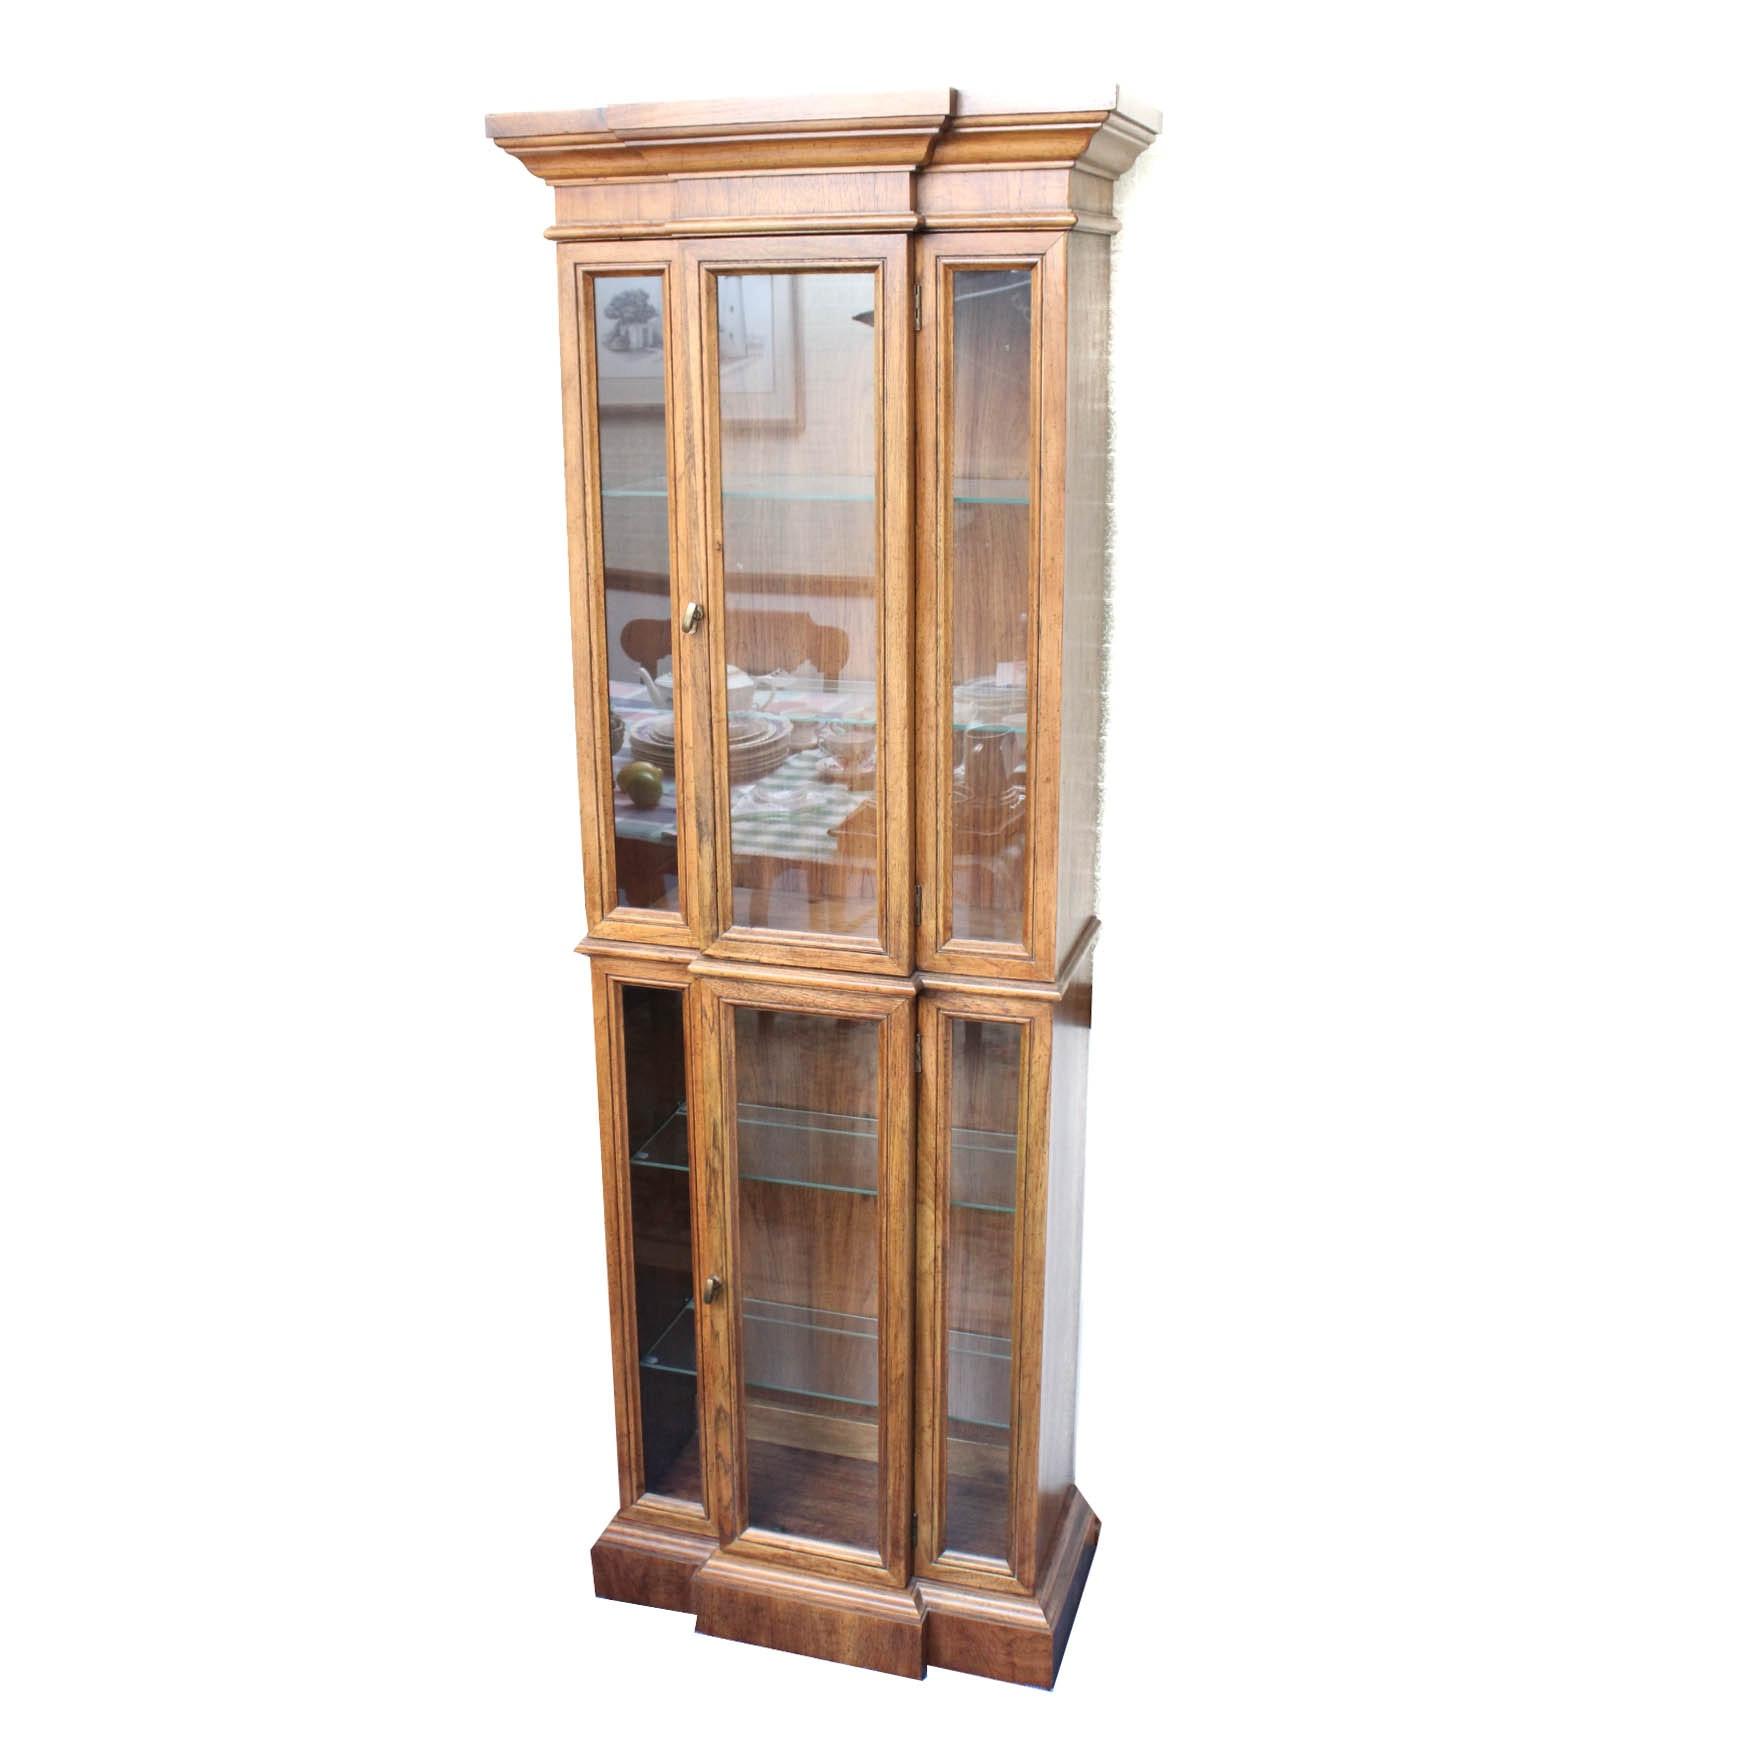 Wood Framed Glass Display Cabinet